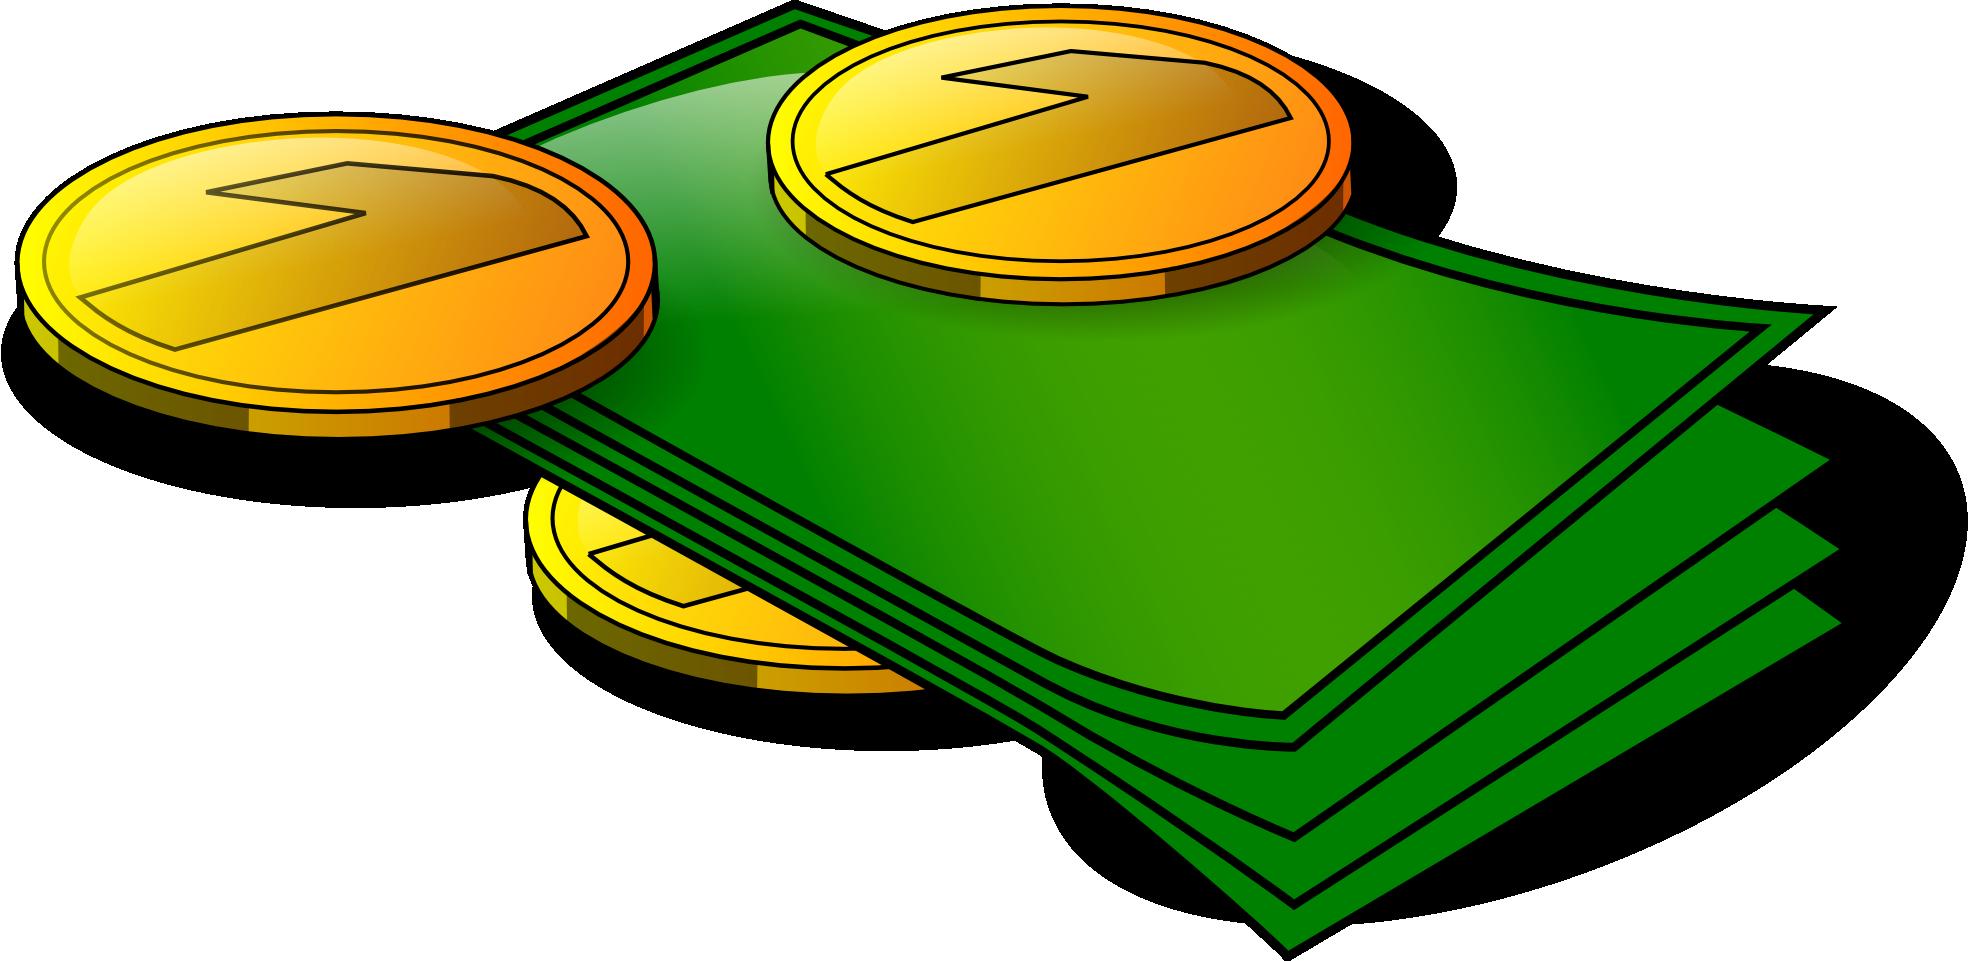 Moneyt clipart transparent svg free Free Transparent Money Cliparts, Download Free Clip Art ... svg free